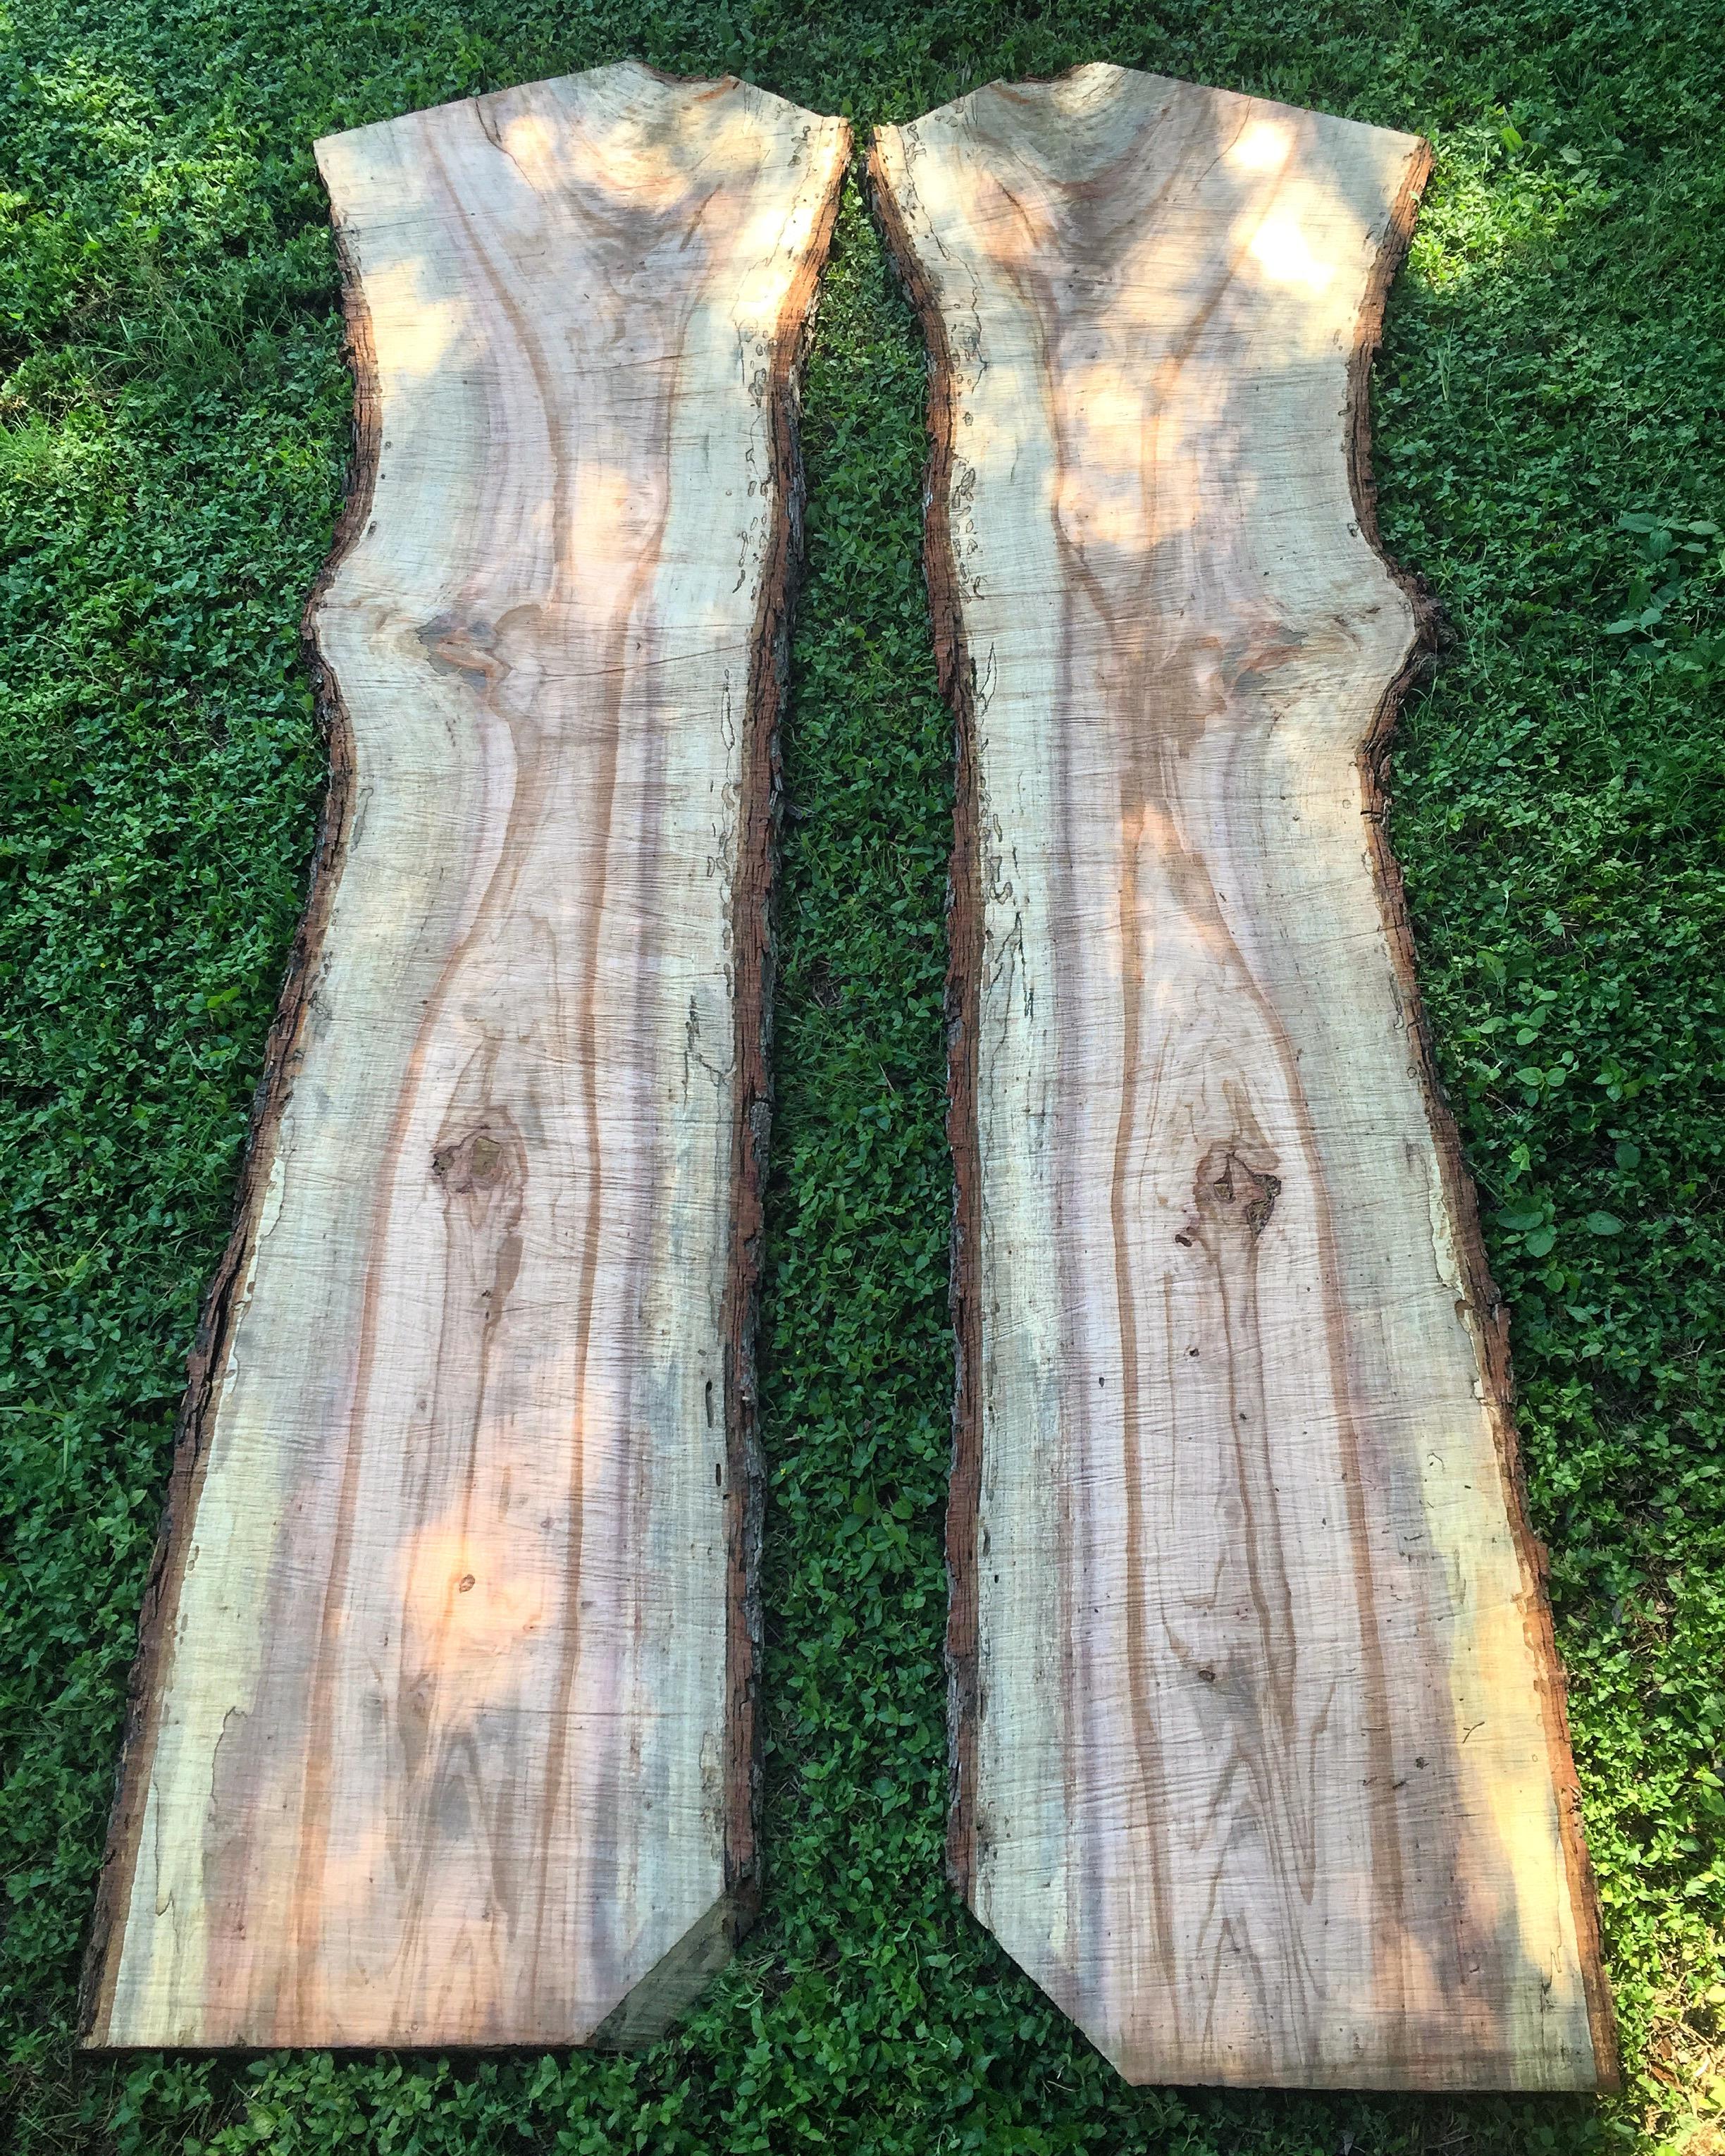 Book-matched Pecan slabs